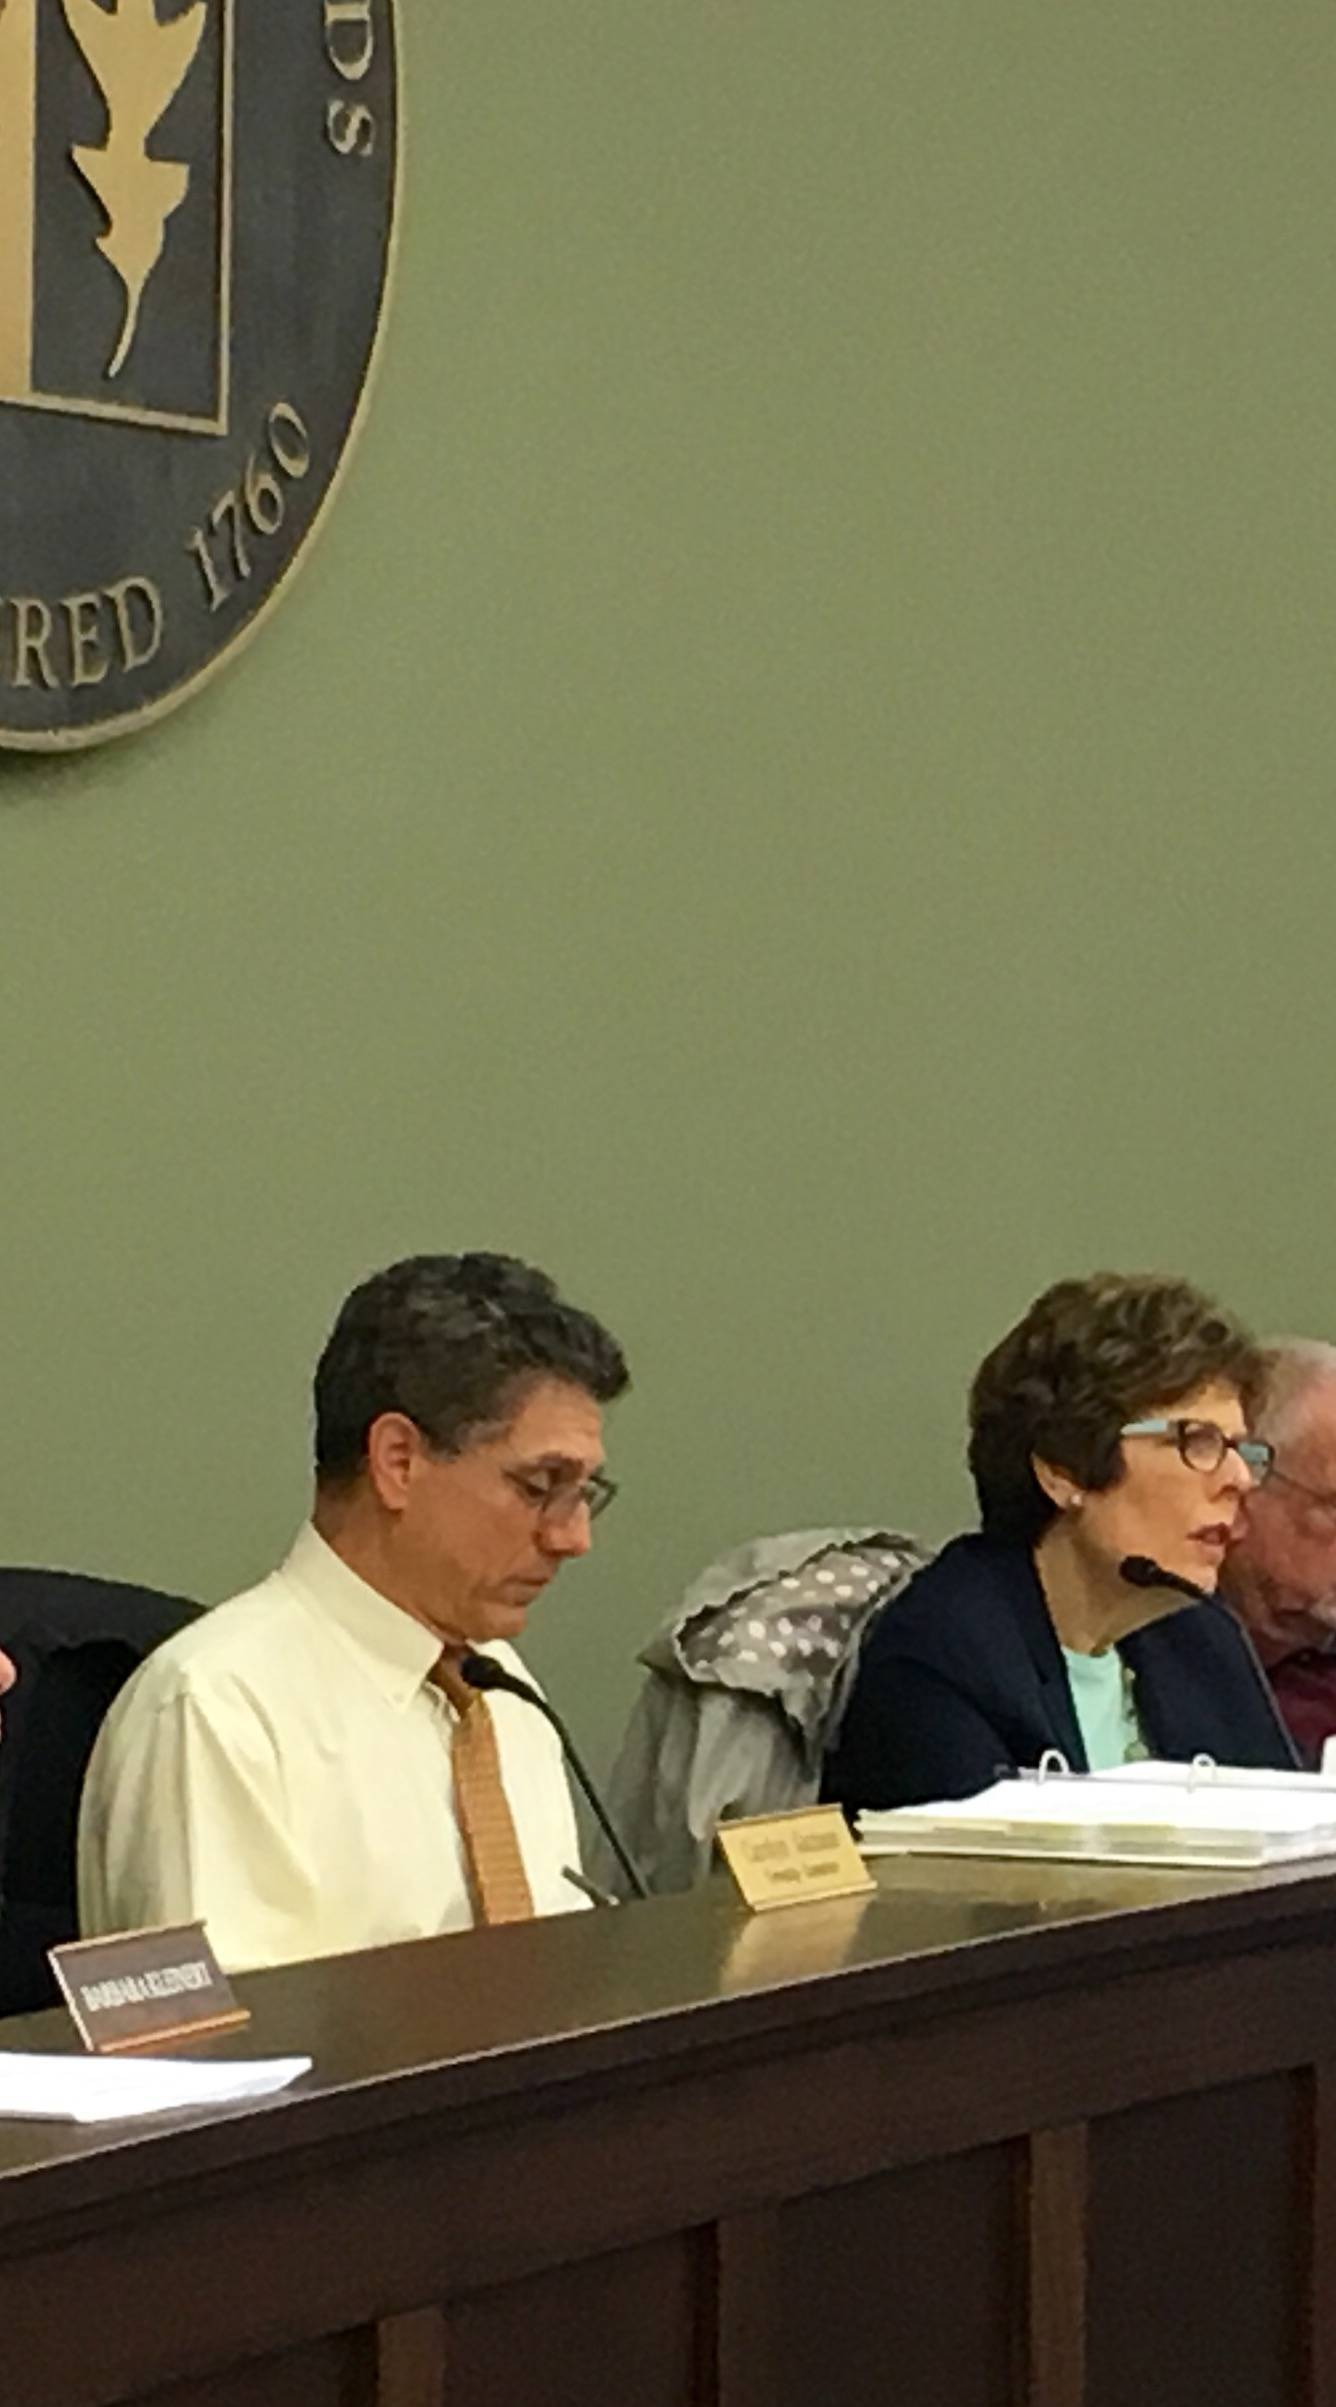 Planning Board Attorney and Board Member Kippy Piedici